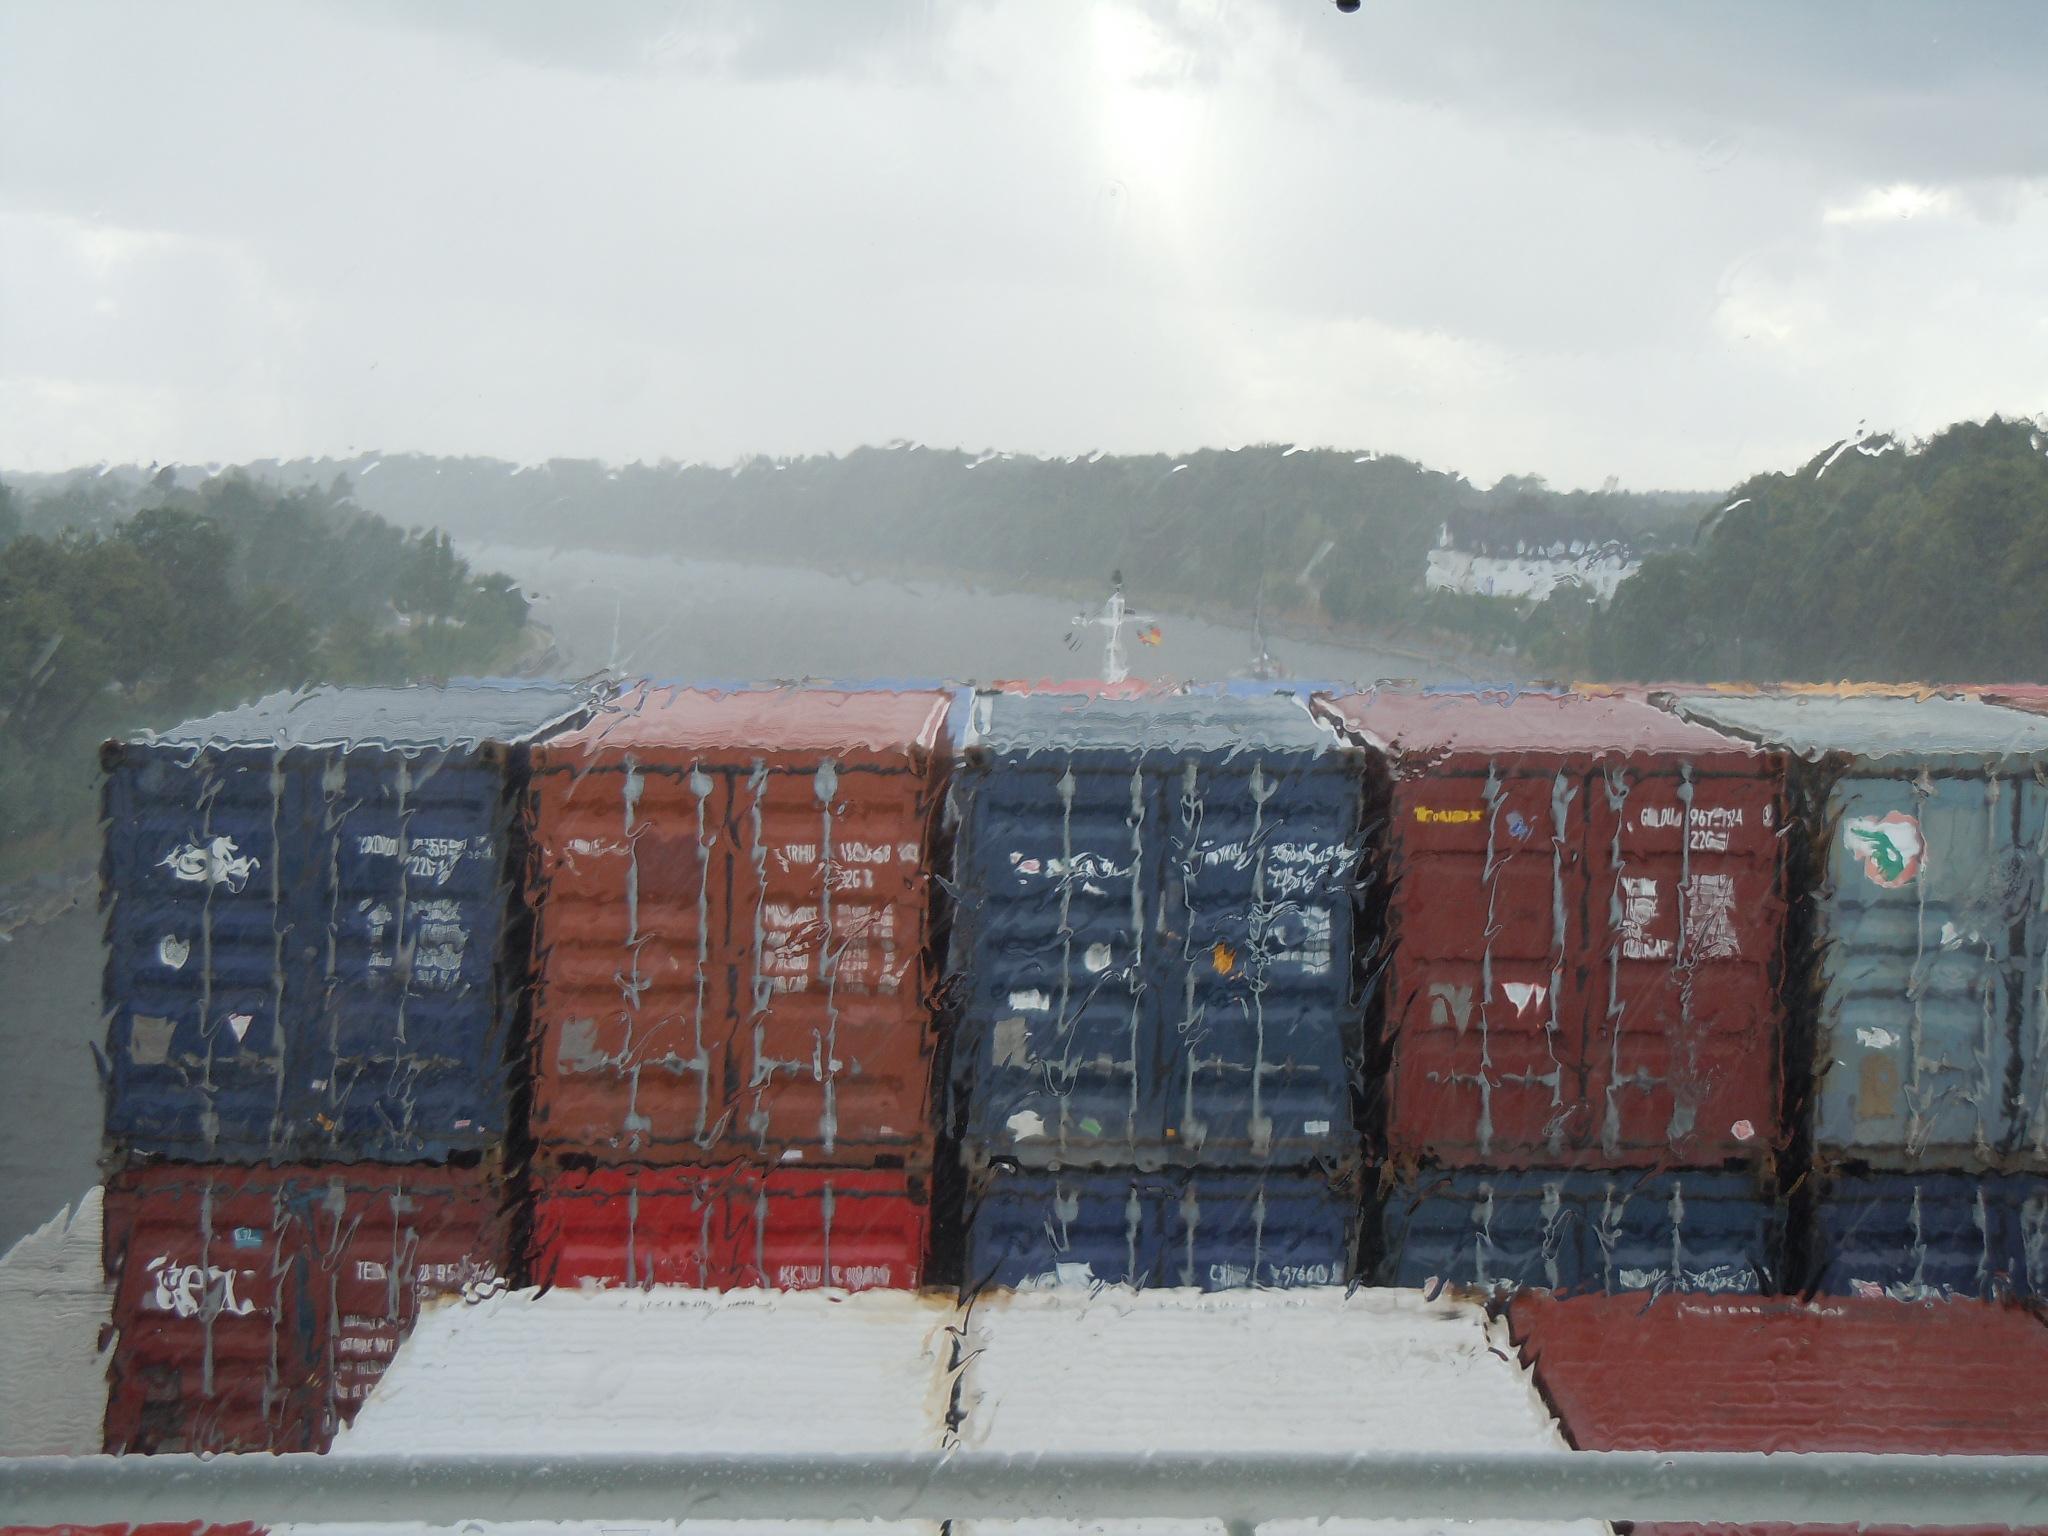 Regen im Nord- Ostseekanal